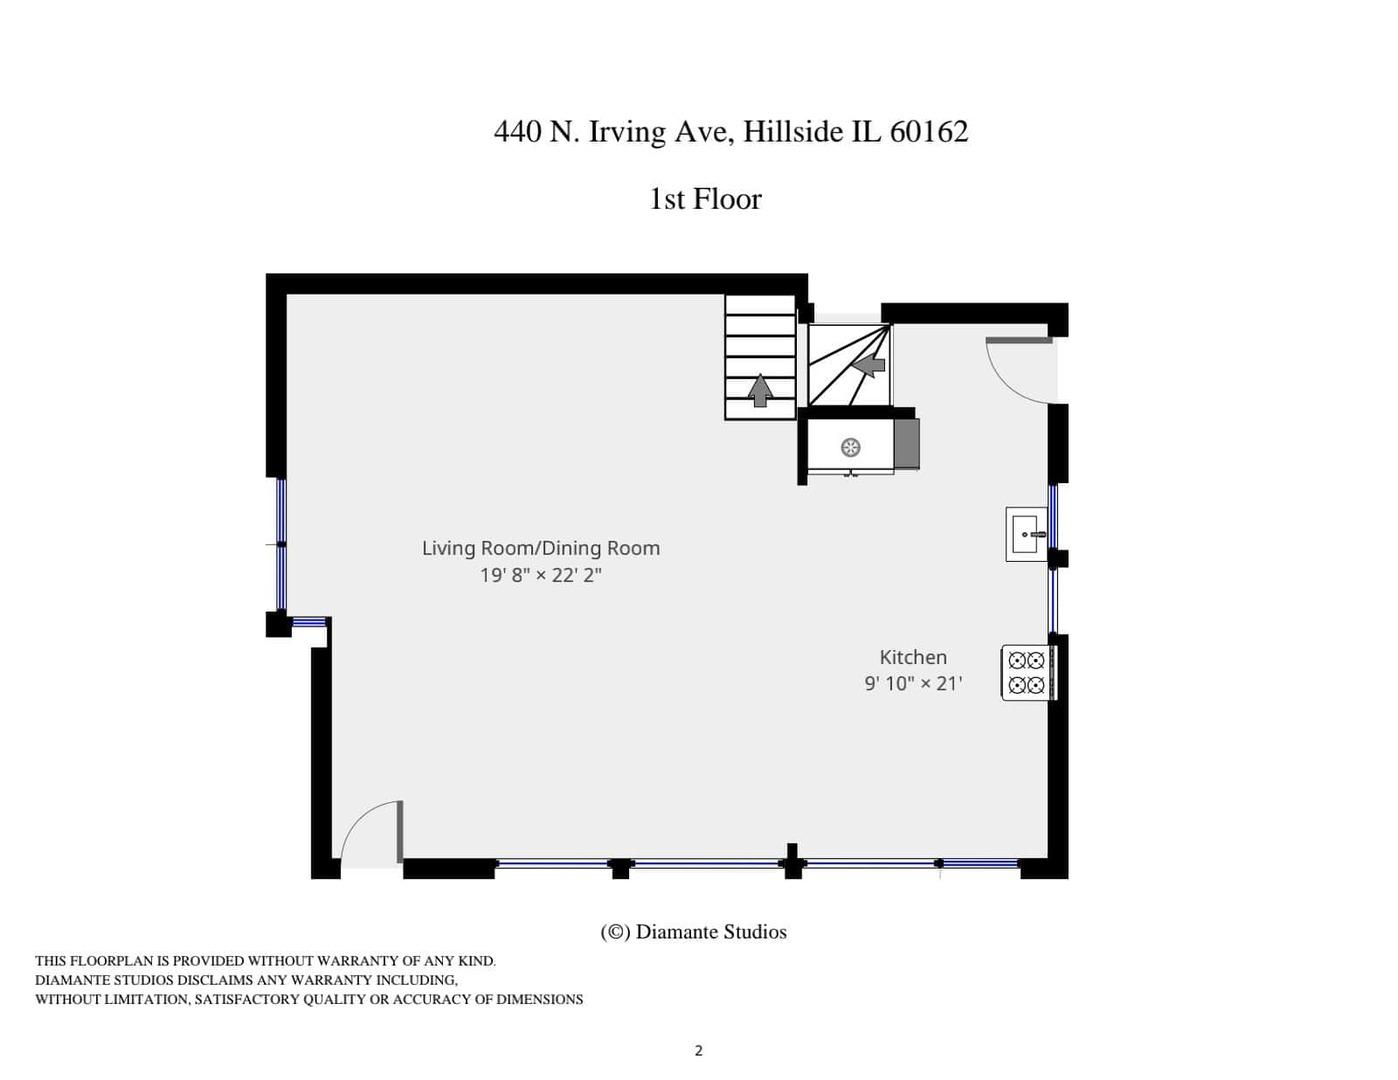 440 North Irving, Hillside, Illinois, 60162